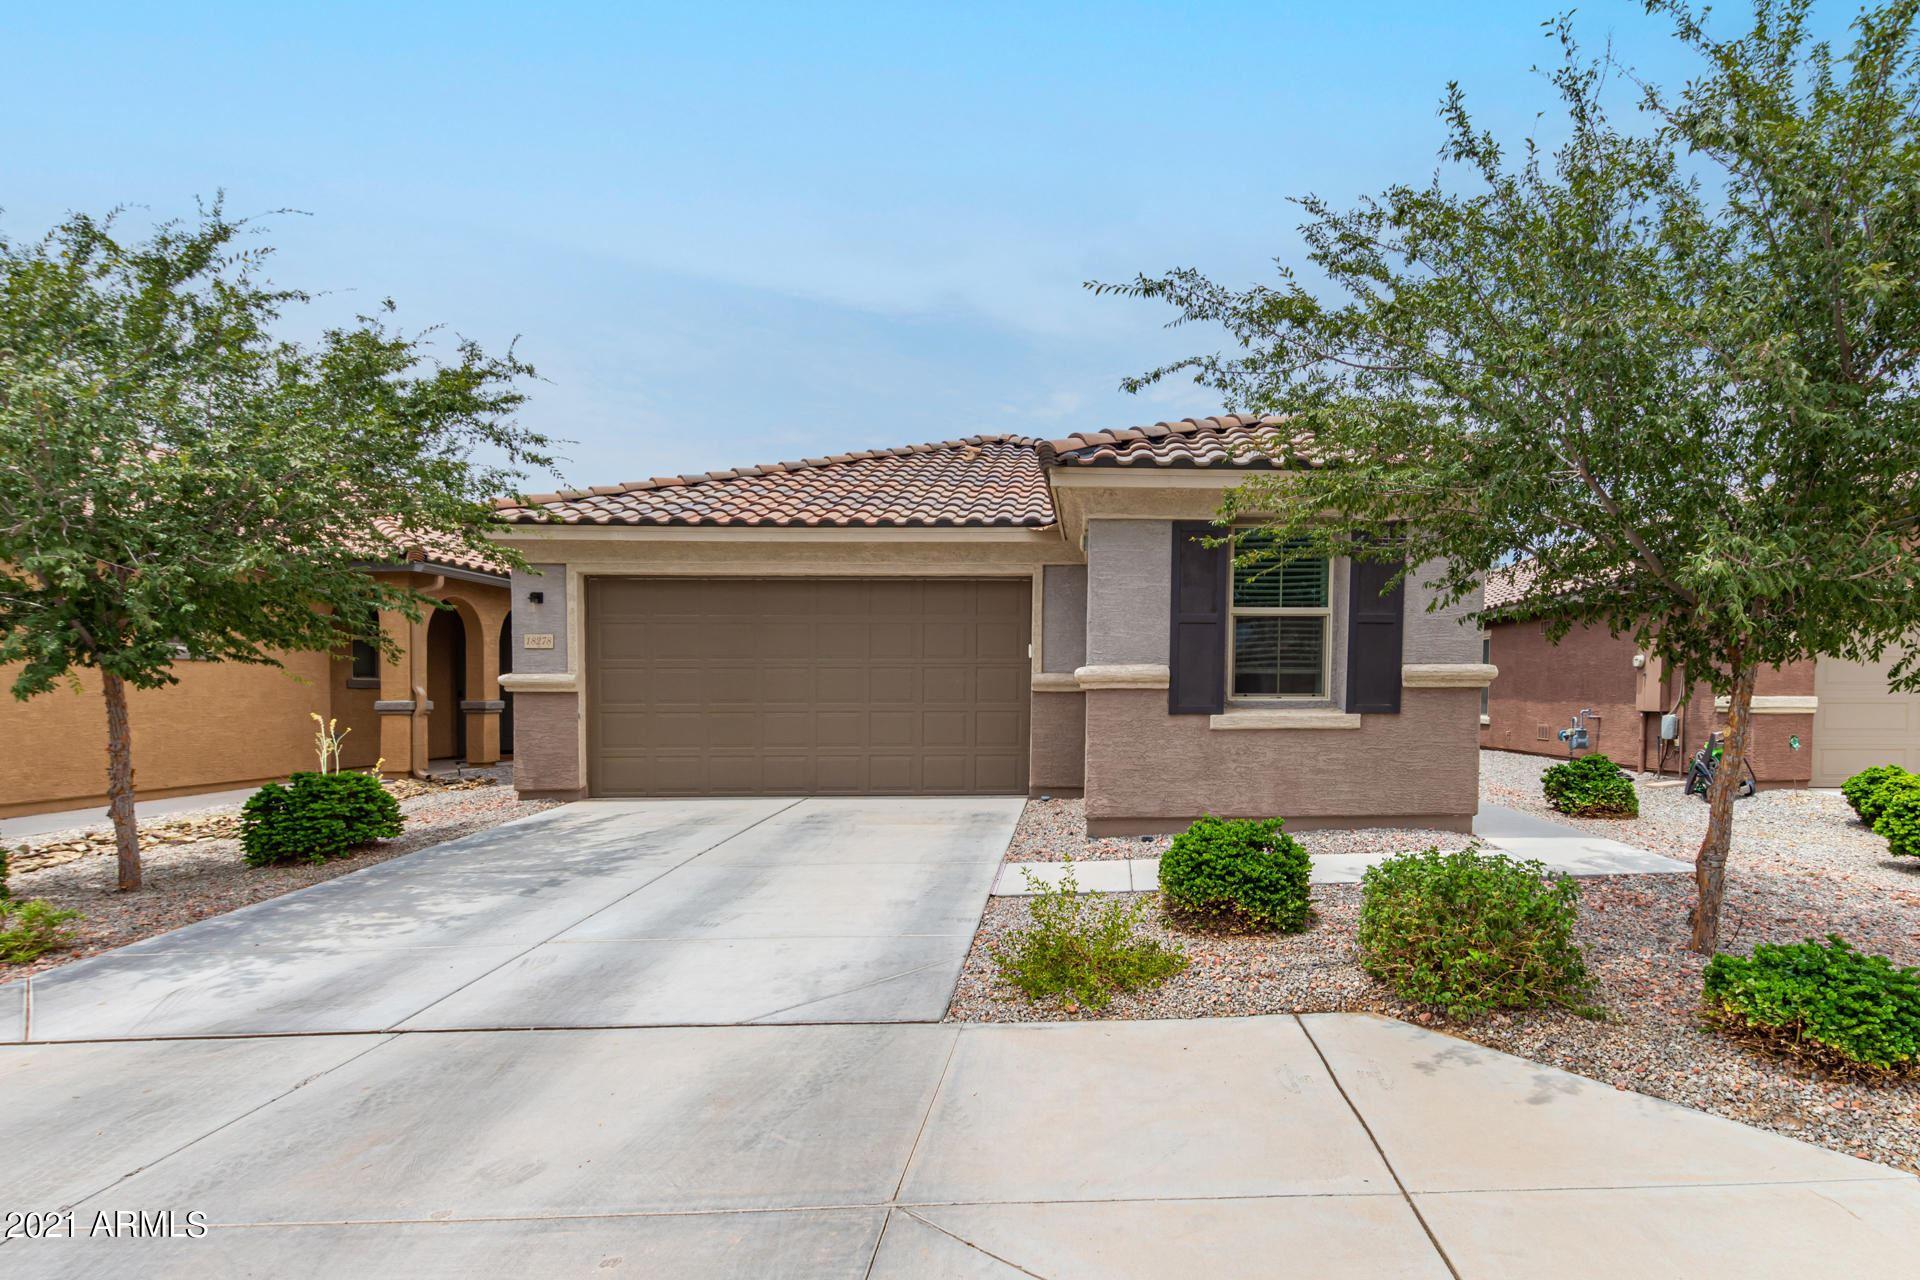 18278 N HOSKIN Drive, Maricopa, AZ 85138 - MLS#: 6266268